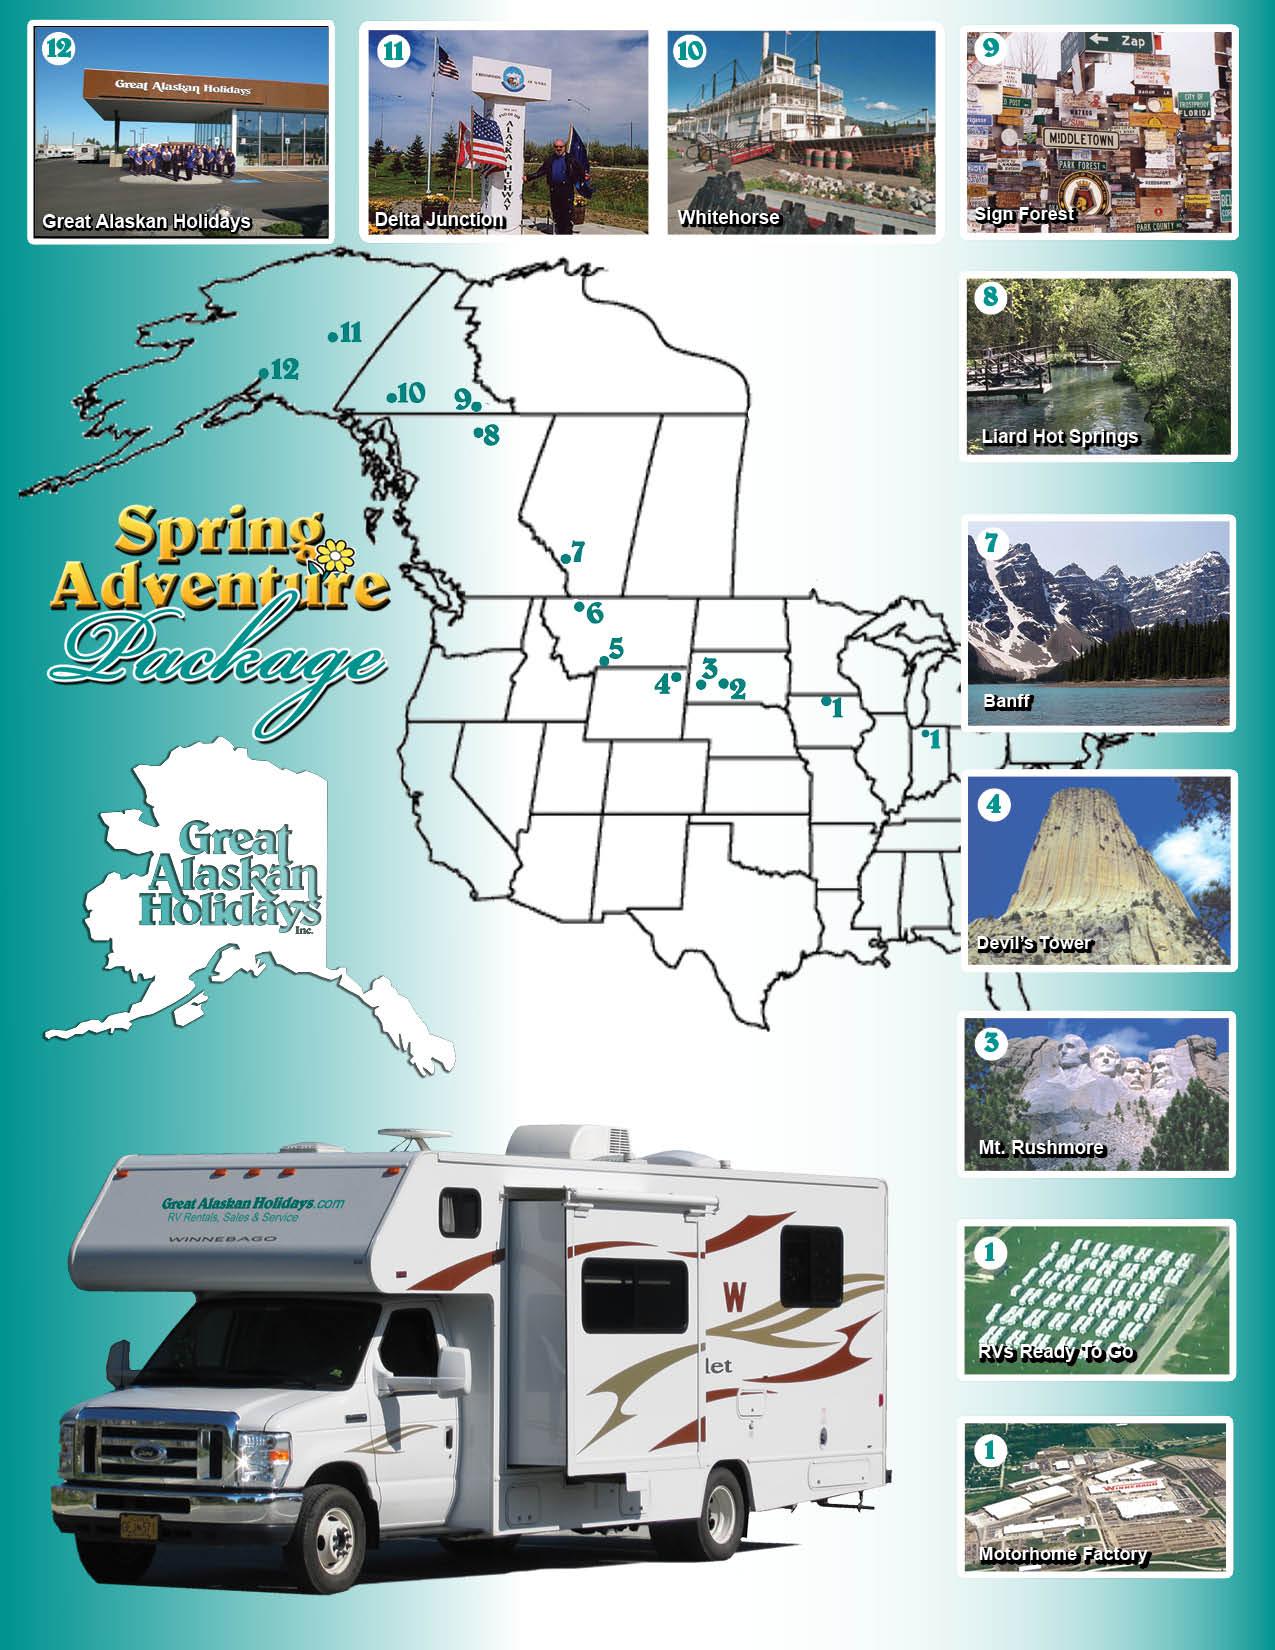 Spring Adventure Package | Great Alaskan Holidays – RV